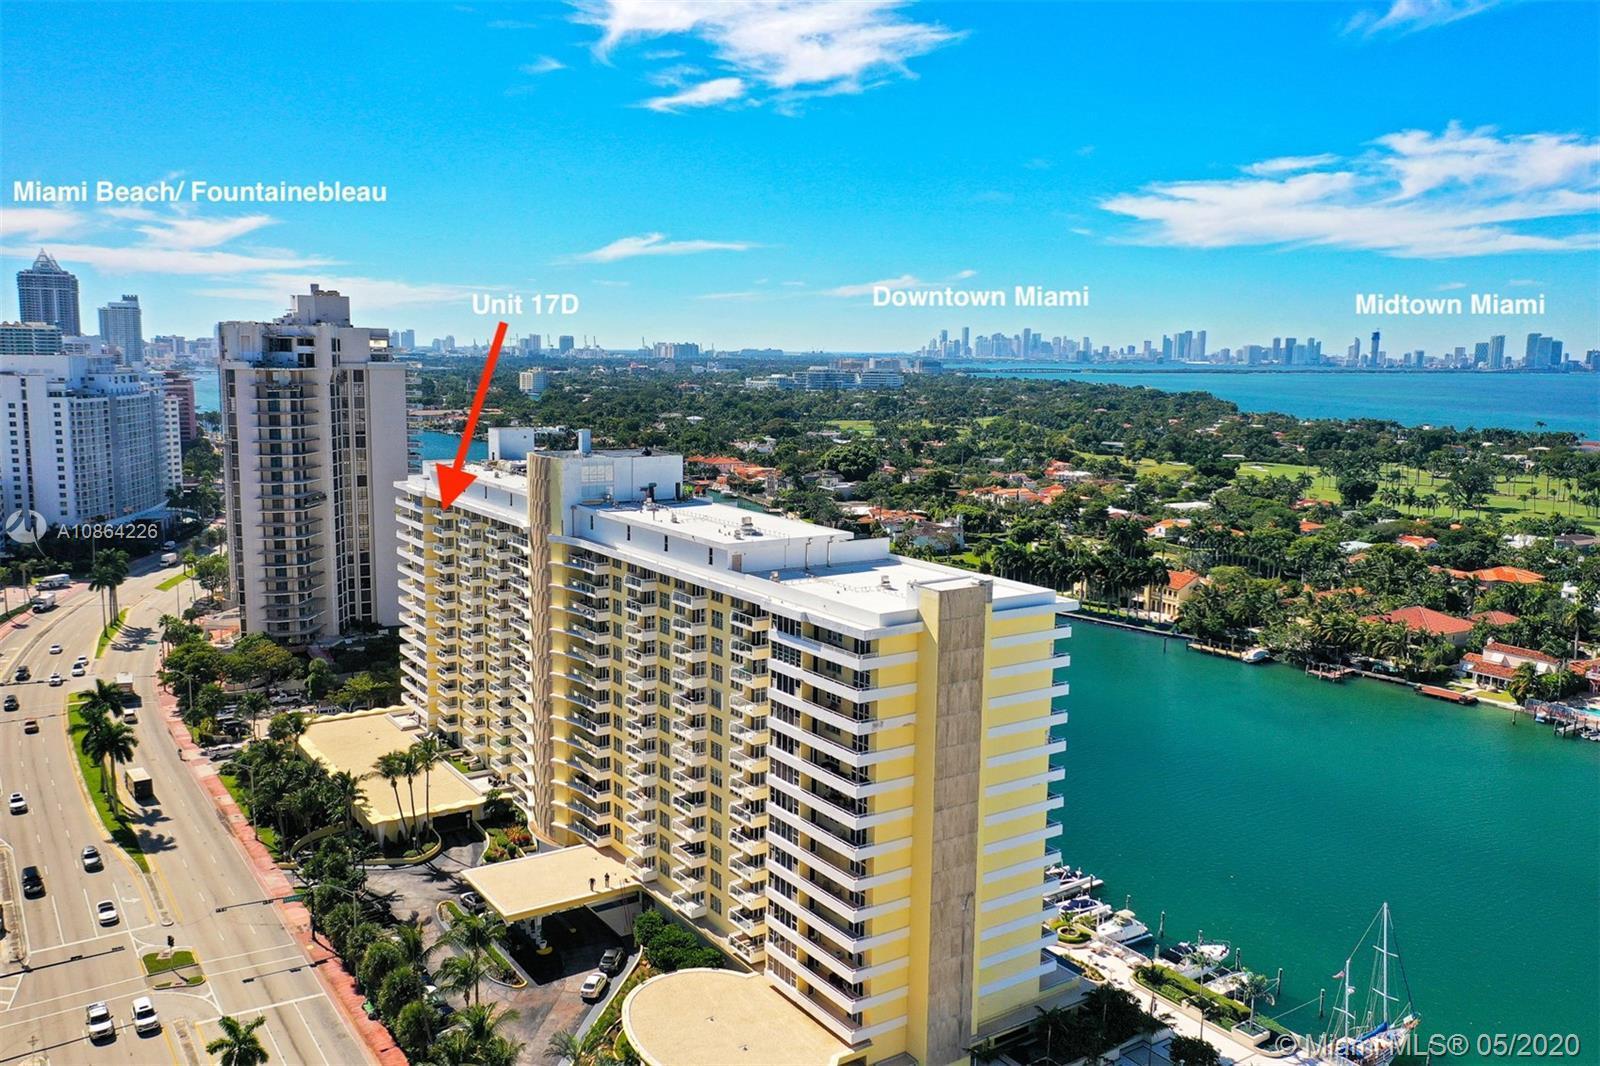 Phenomenal Miami Beach location! Beautiful 17th floor unit is the top floor of this 2/2 split floorp